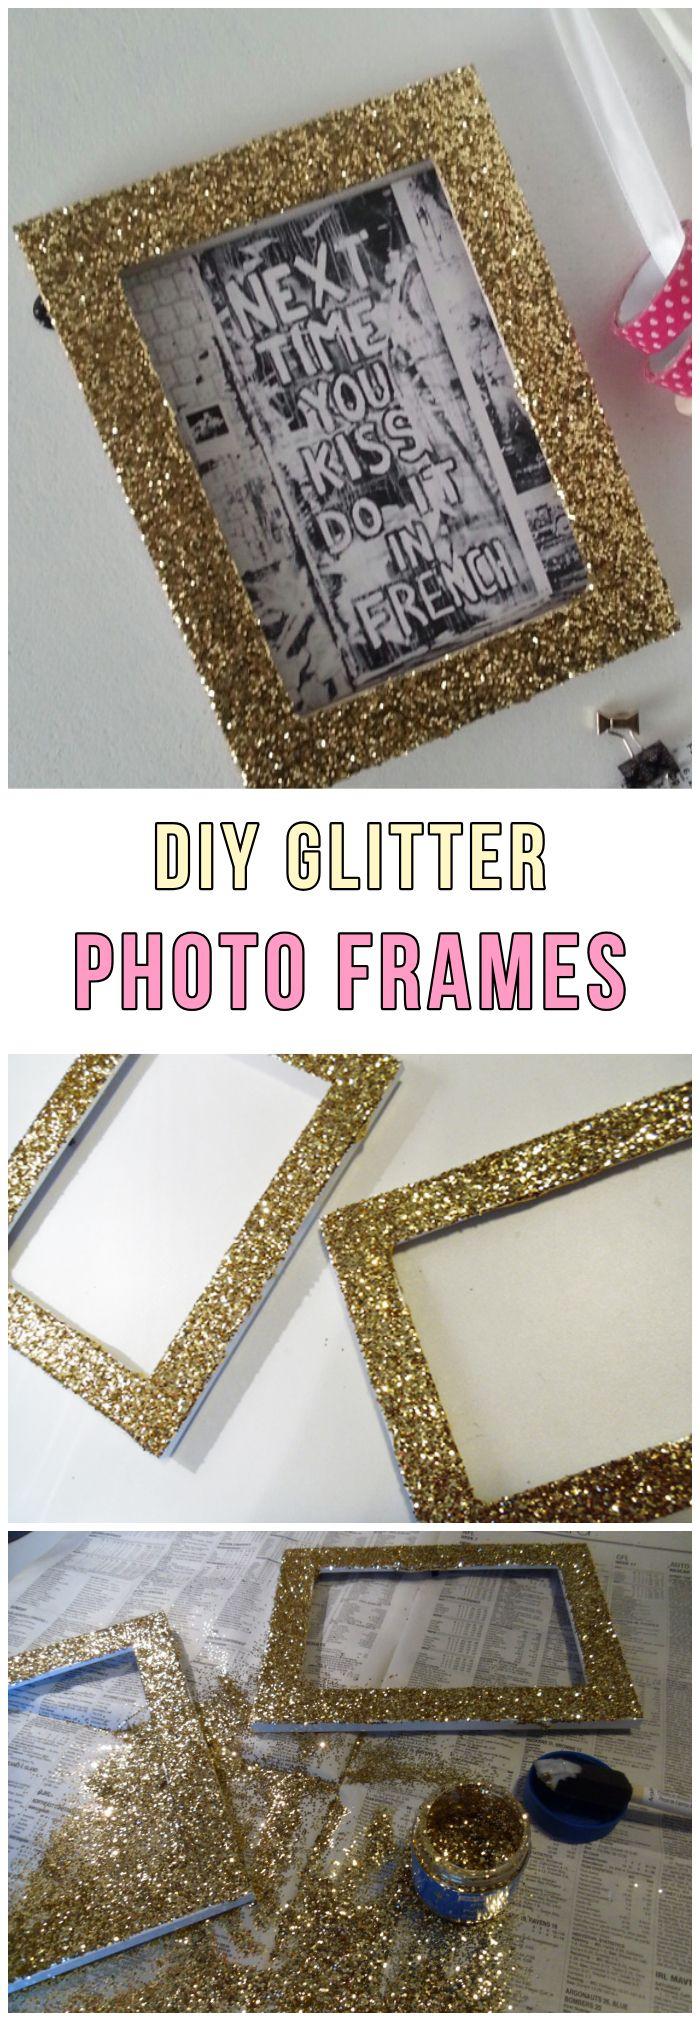 3 Simple Ideas For Glittered Decorations Glitter Diy Glitter